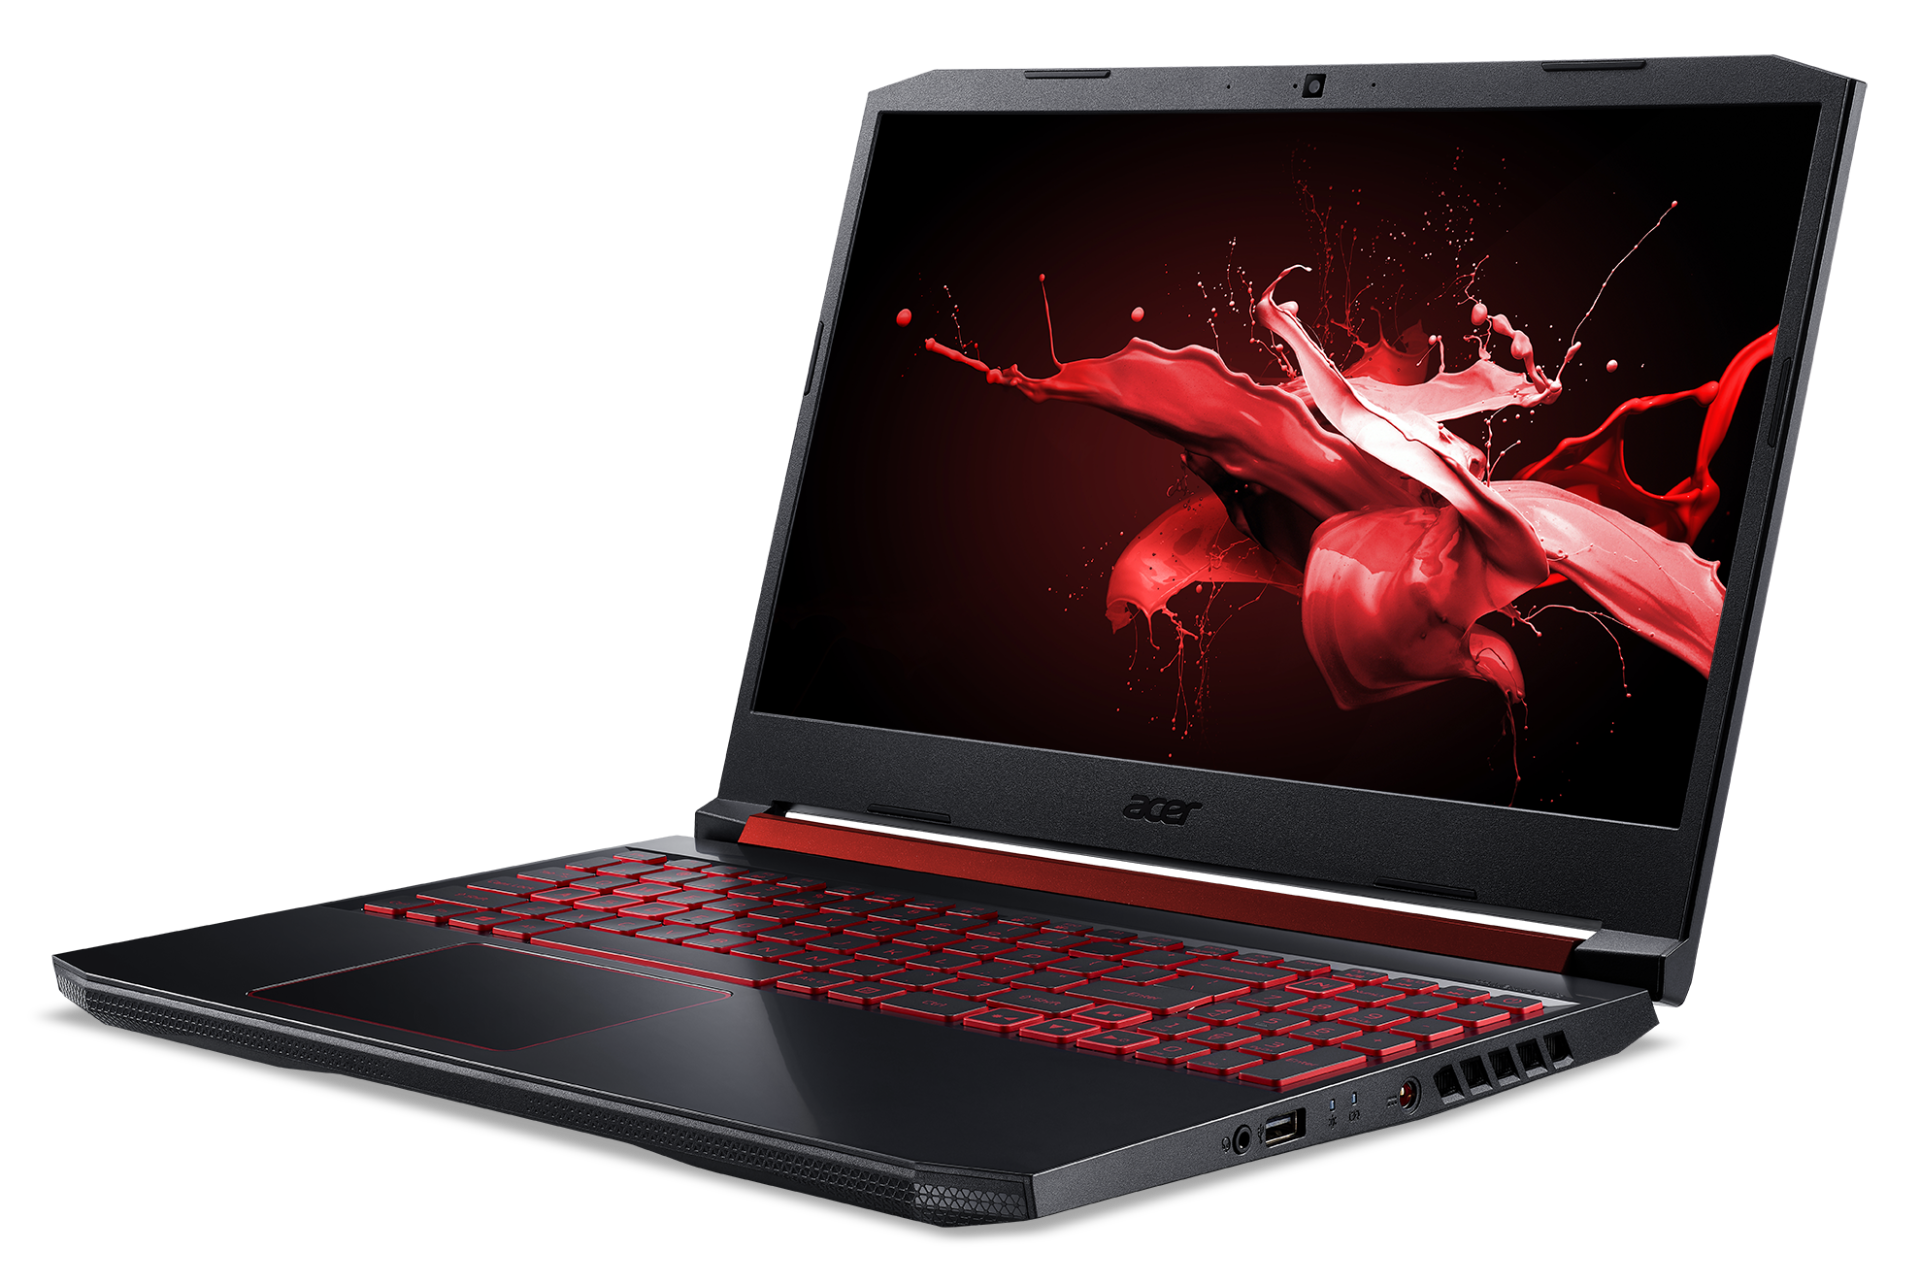 Acer Nitro 5 Gaming Laptop, 9th Gen Intel Core i7-9750H